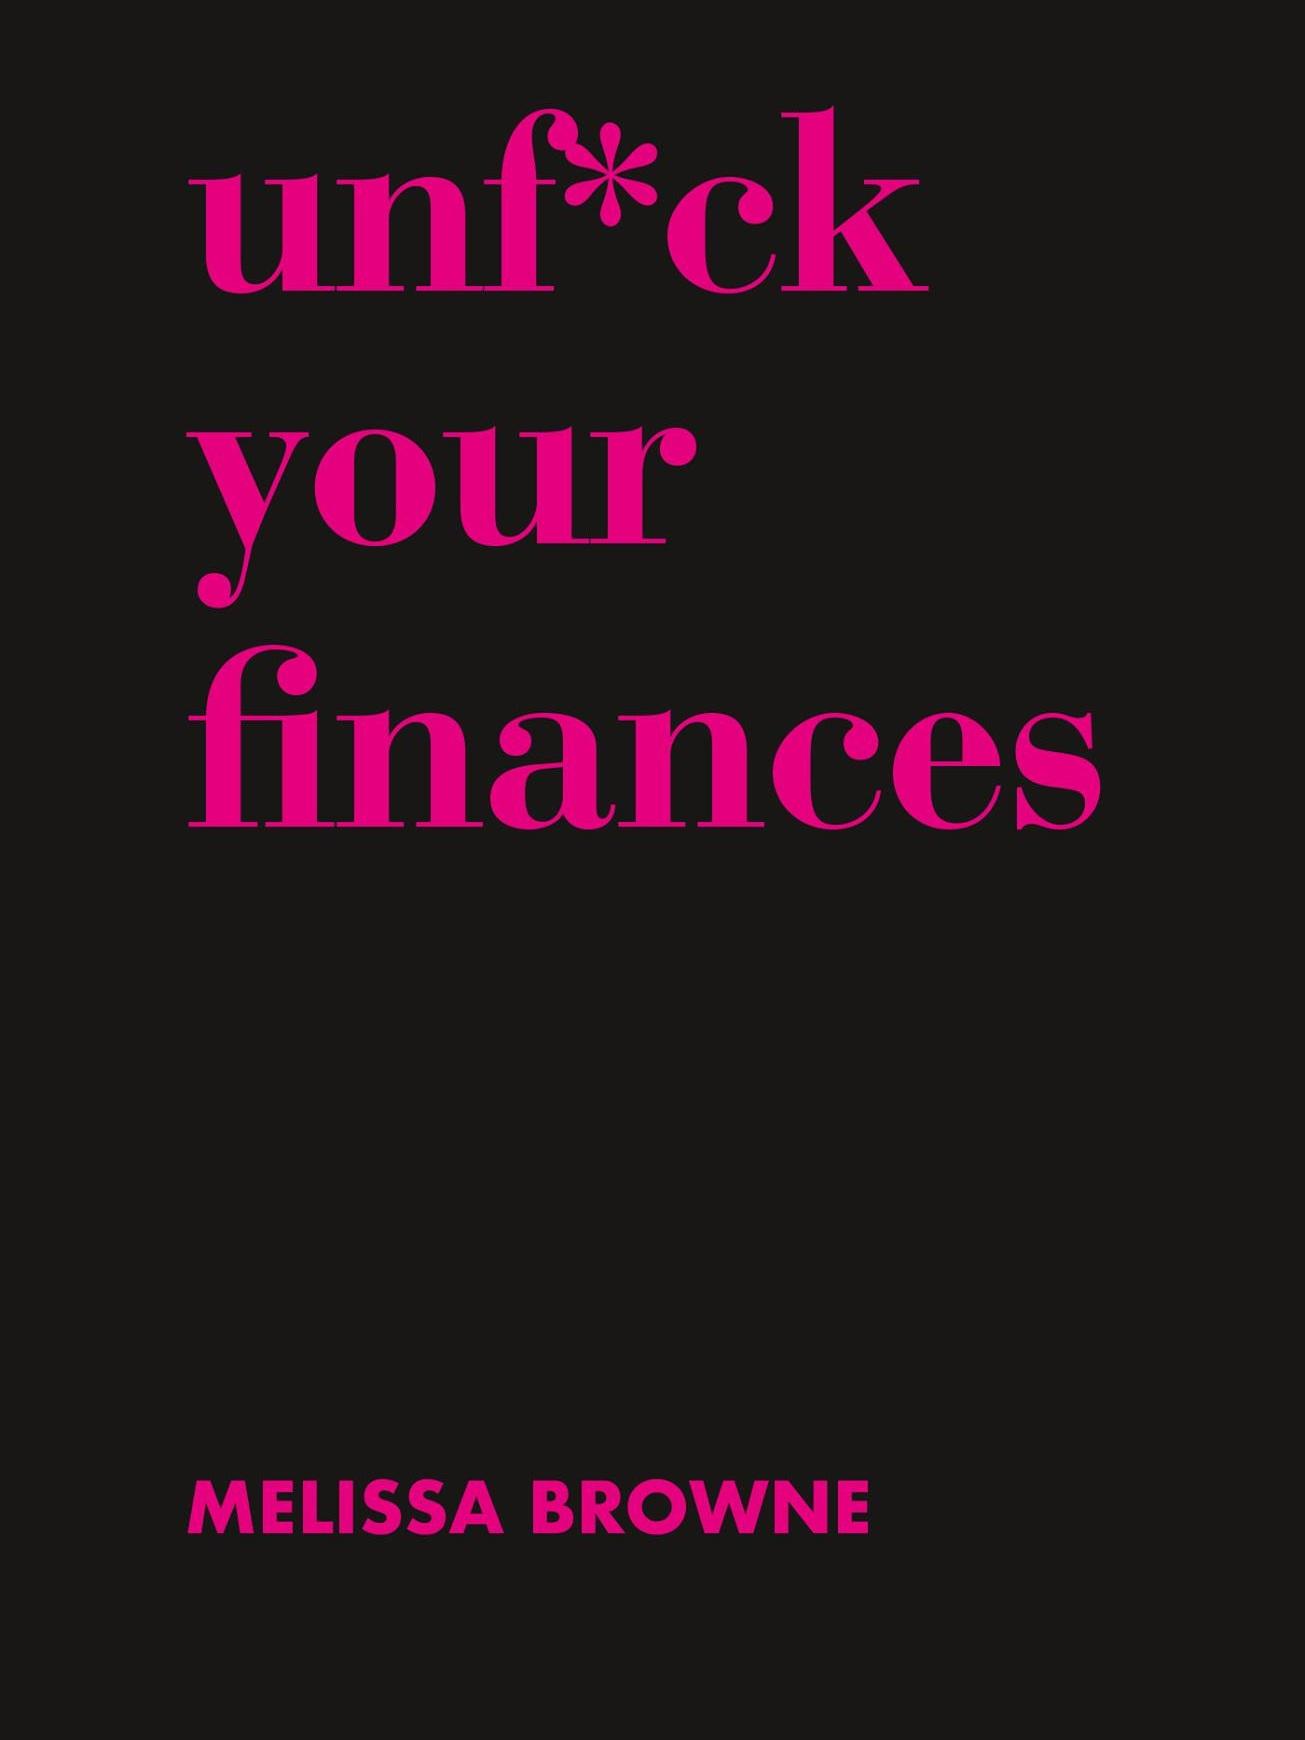 Unfck-your-finances.jpg